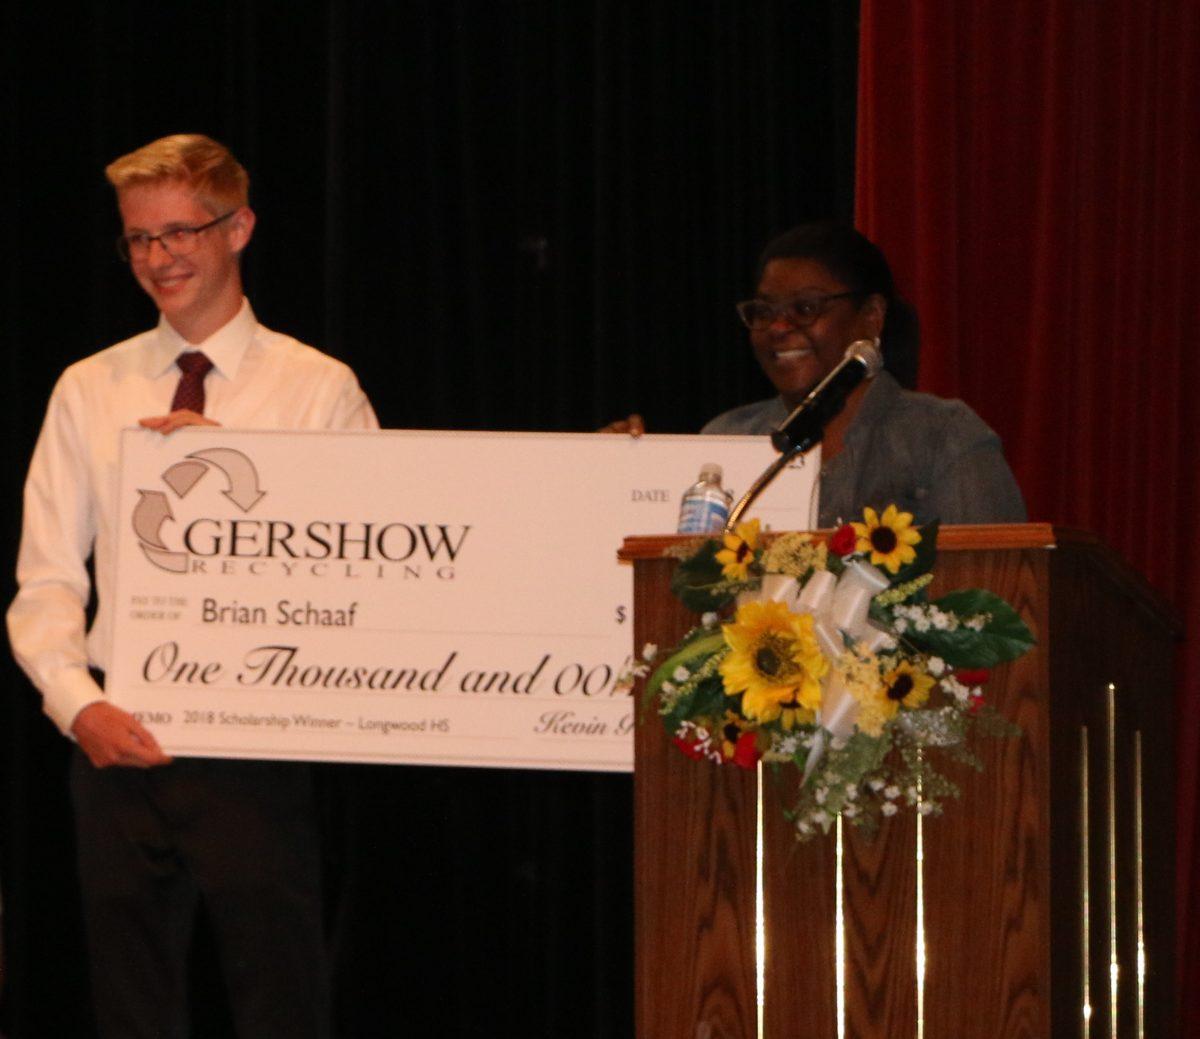 Gershow Recycling Grants Environmental Conservation Scholarship to Longwood High School Graduating Senior Brian Schaaf